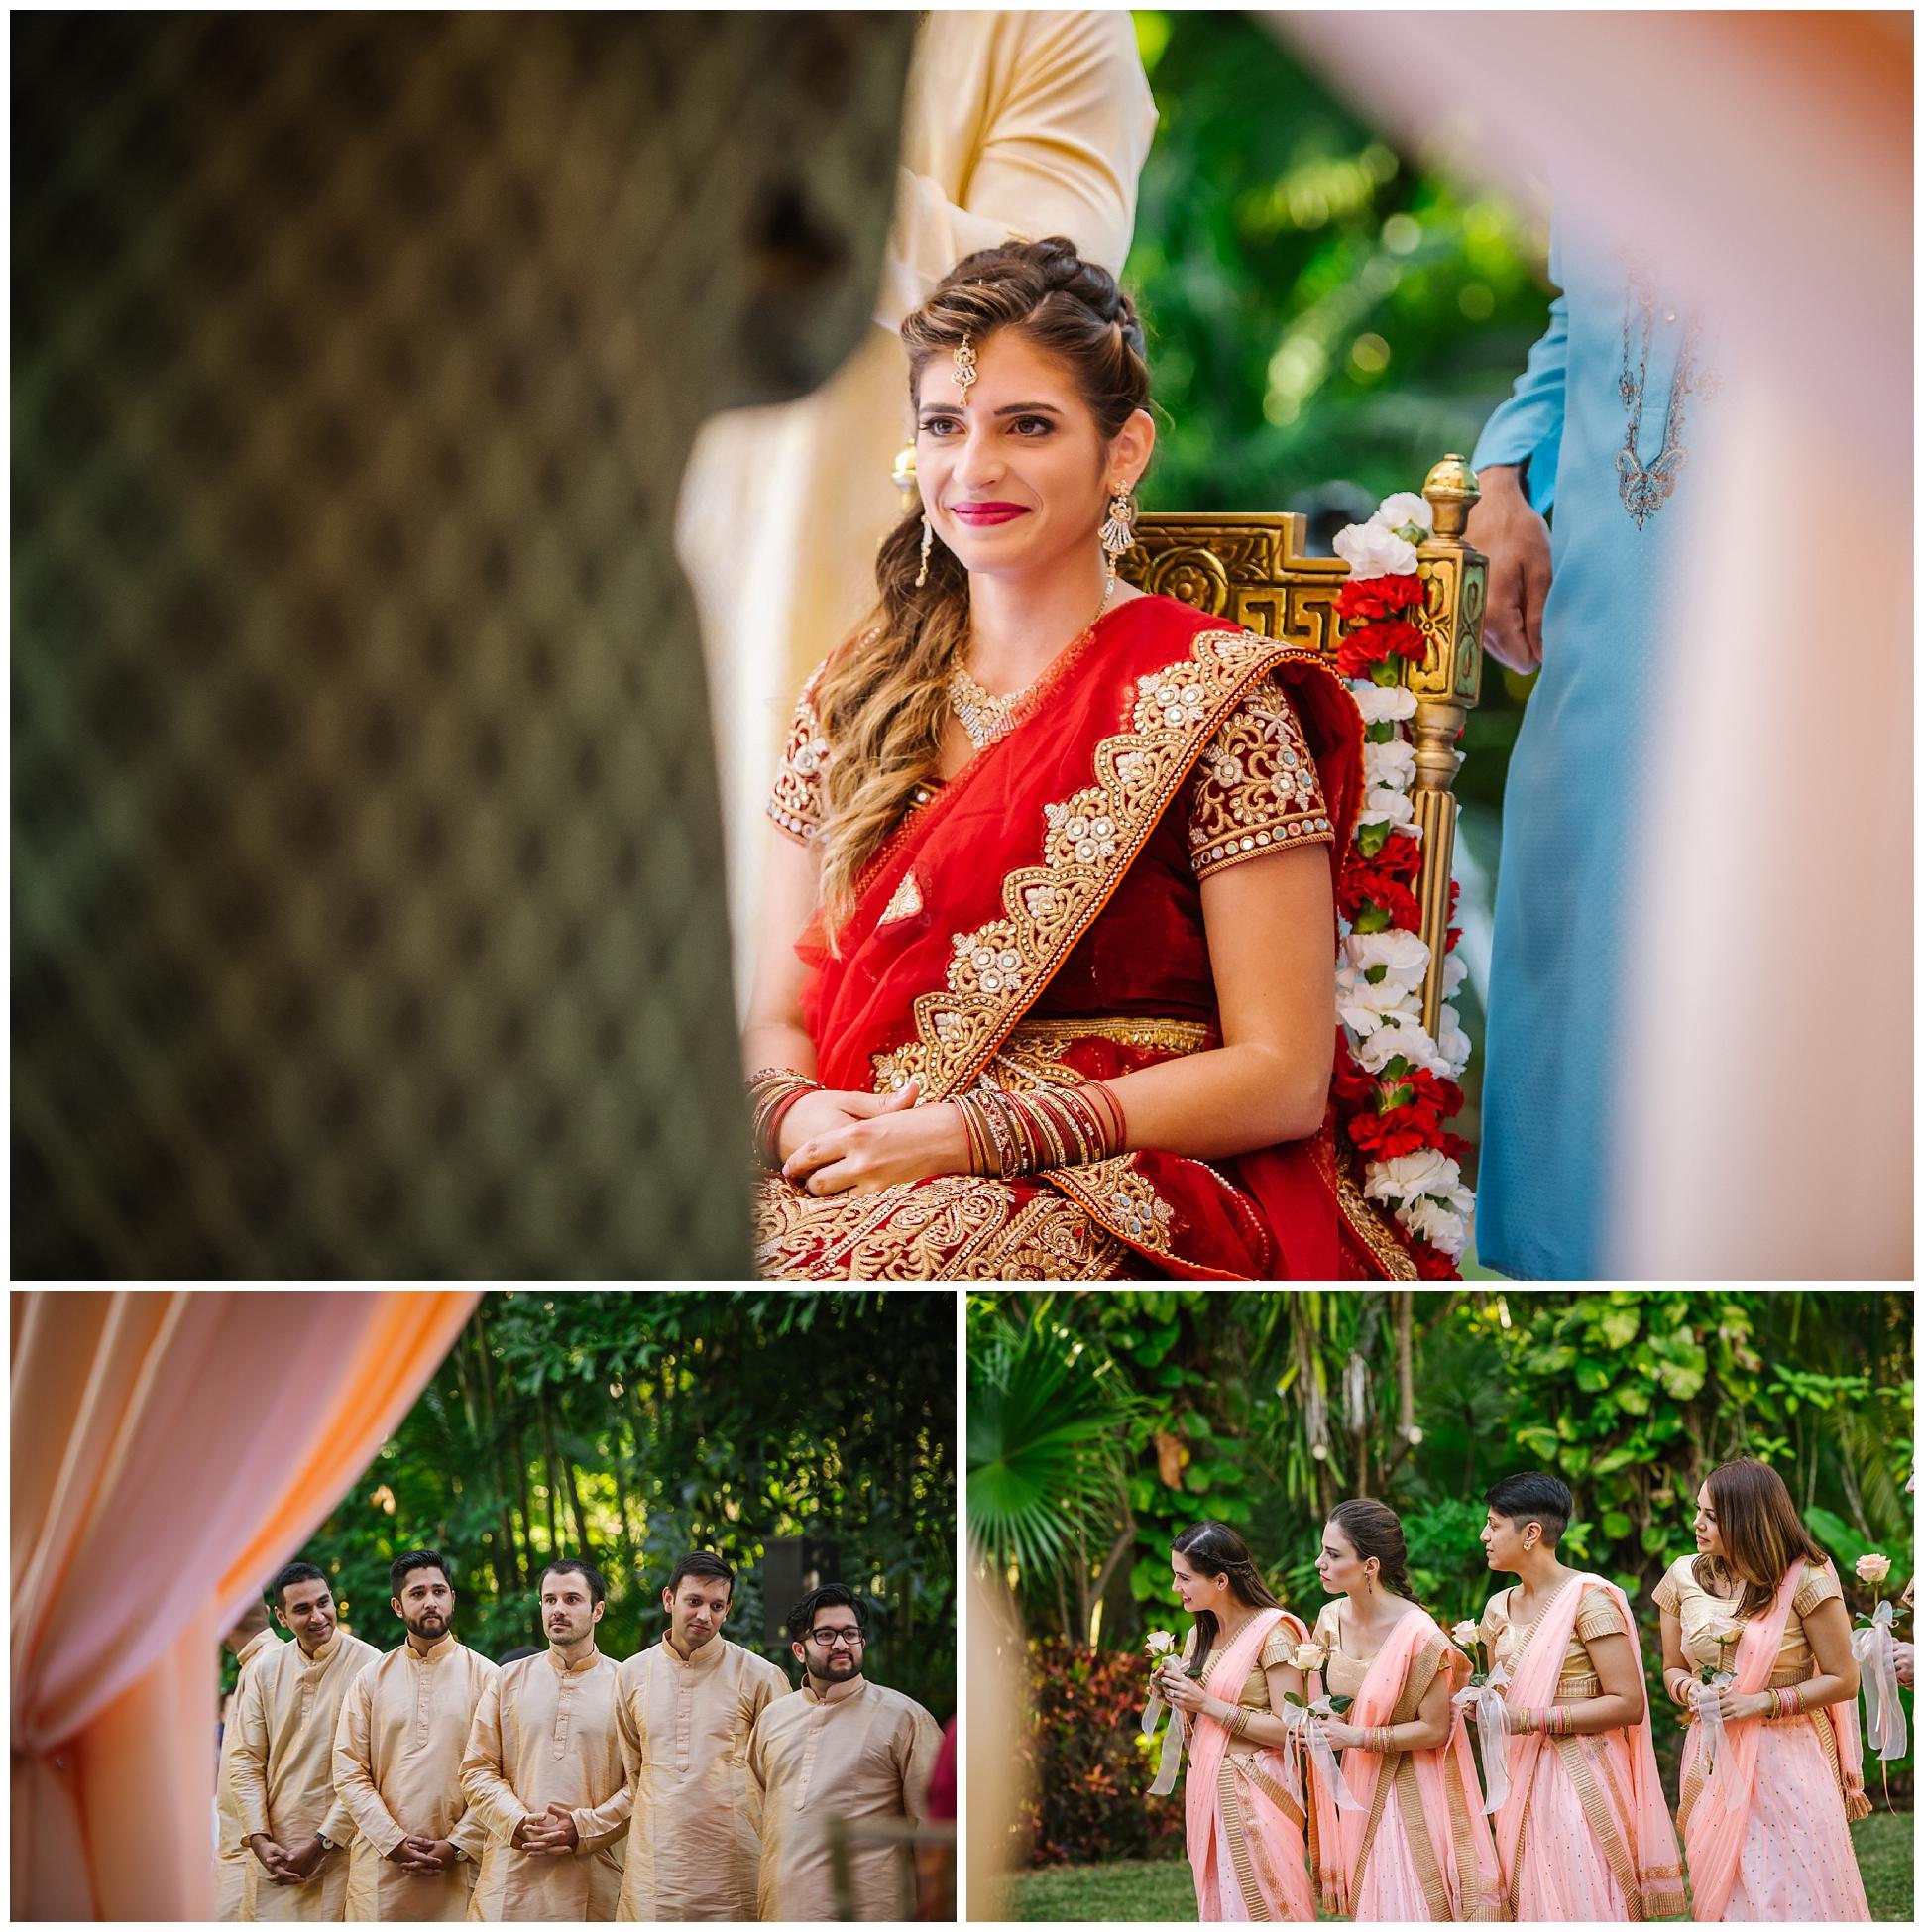 St-pete-indian-wedding-photographer-barat-sunken-gardens_0108.jpg